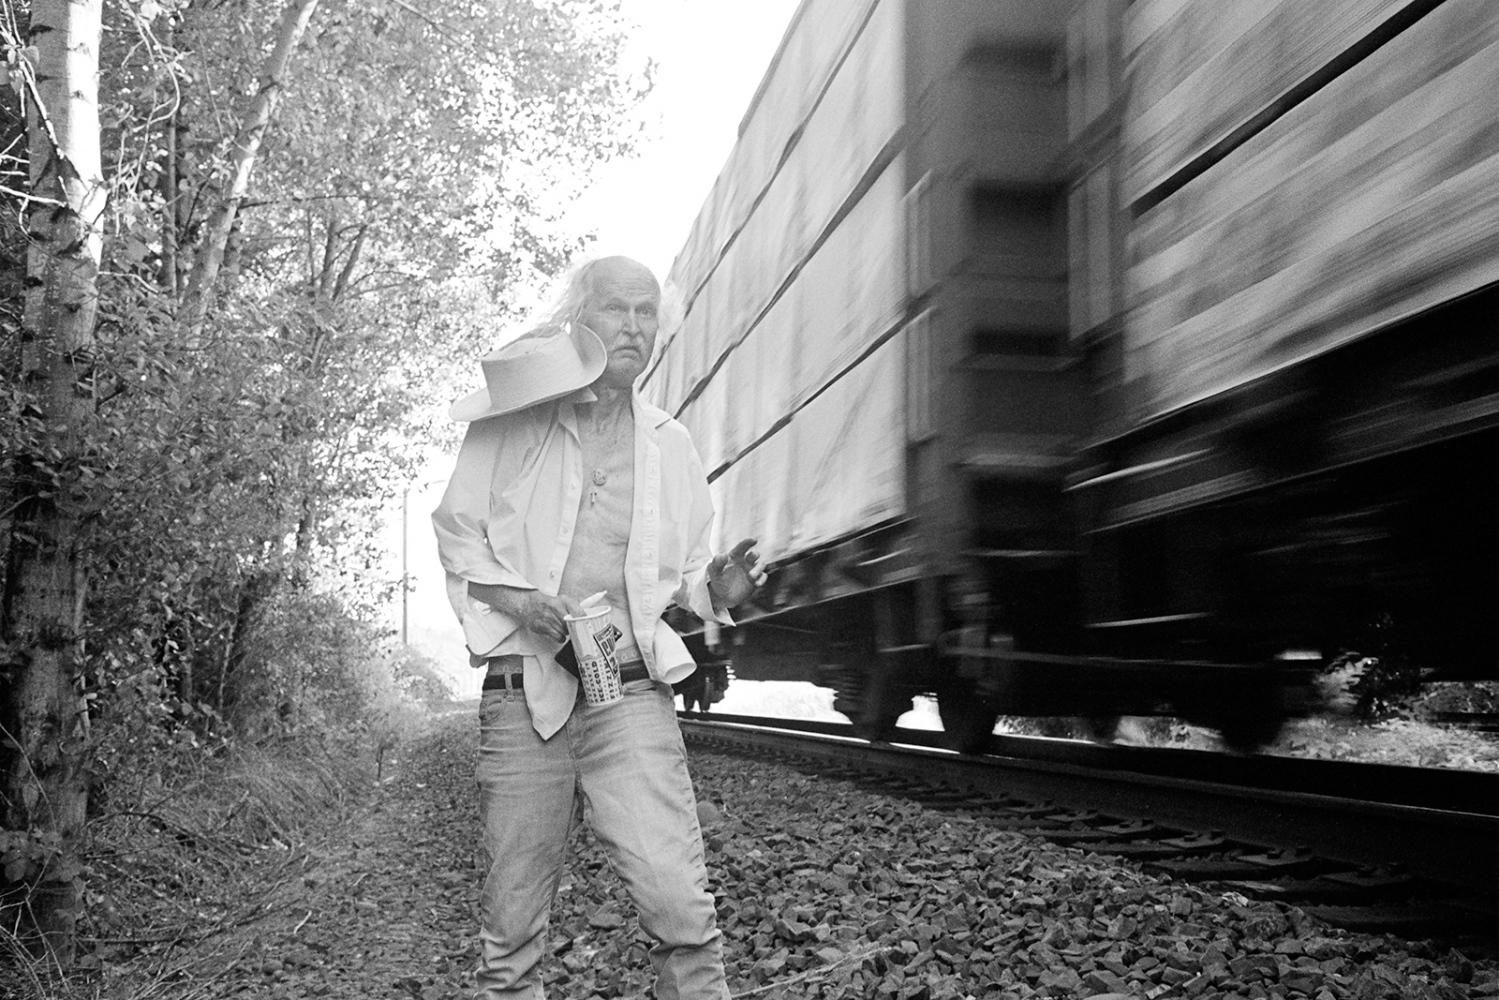 Art and Documentary Photography - Loading LF_vis_024.jpg